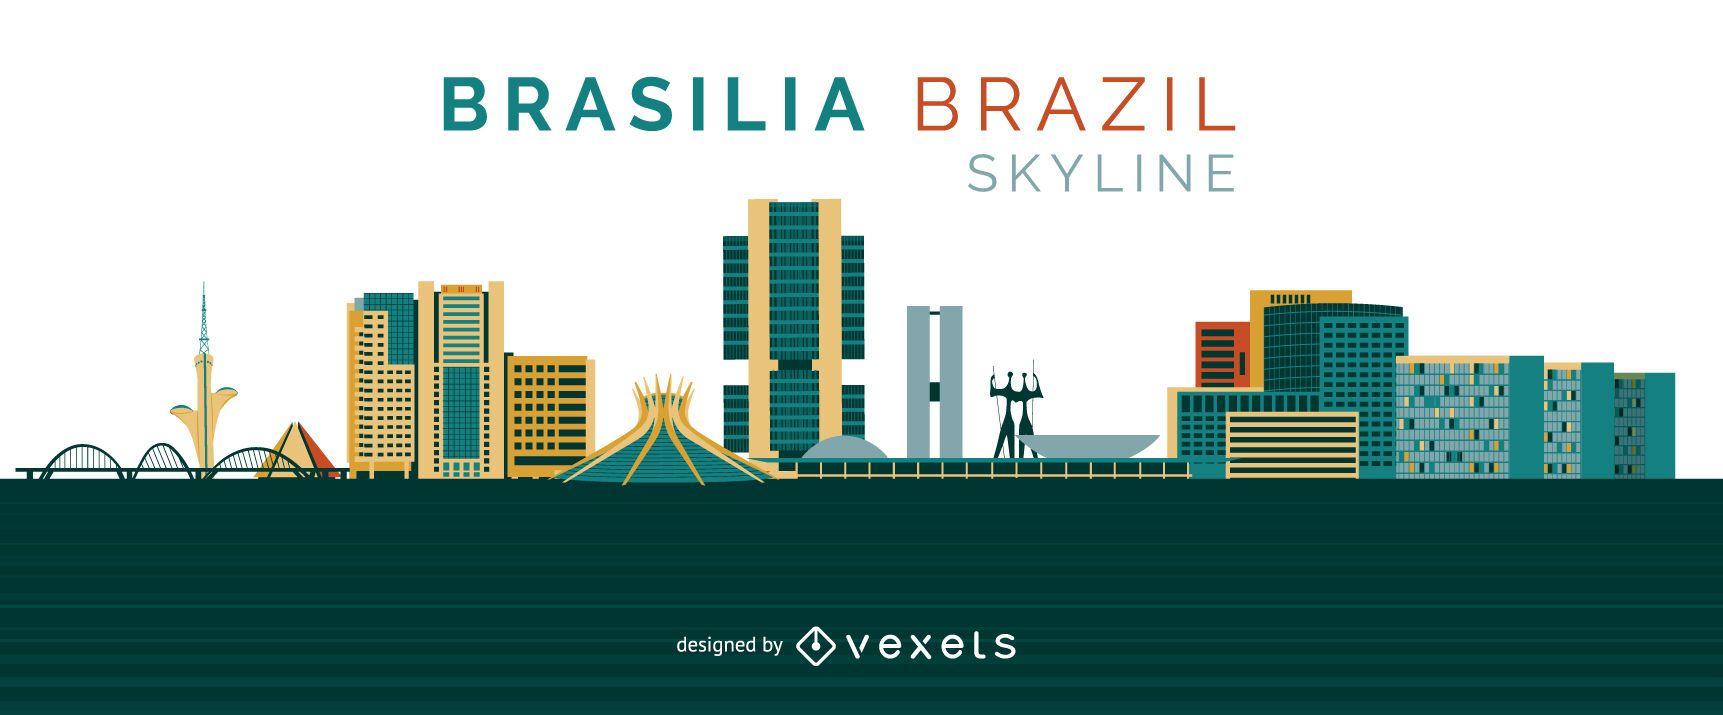 Brasilia skyline design